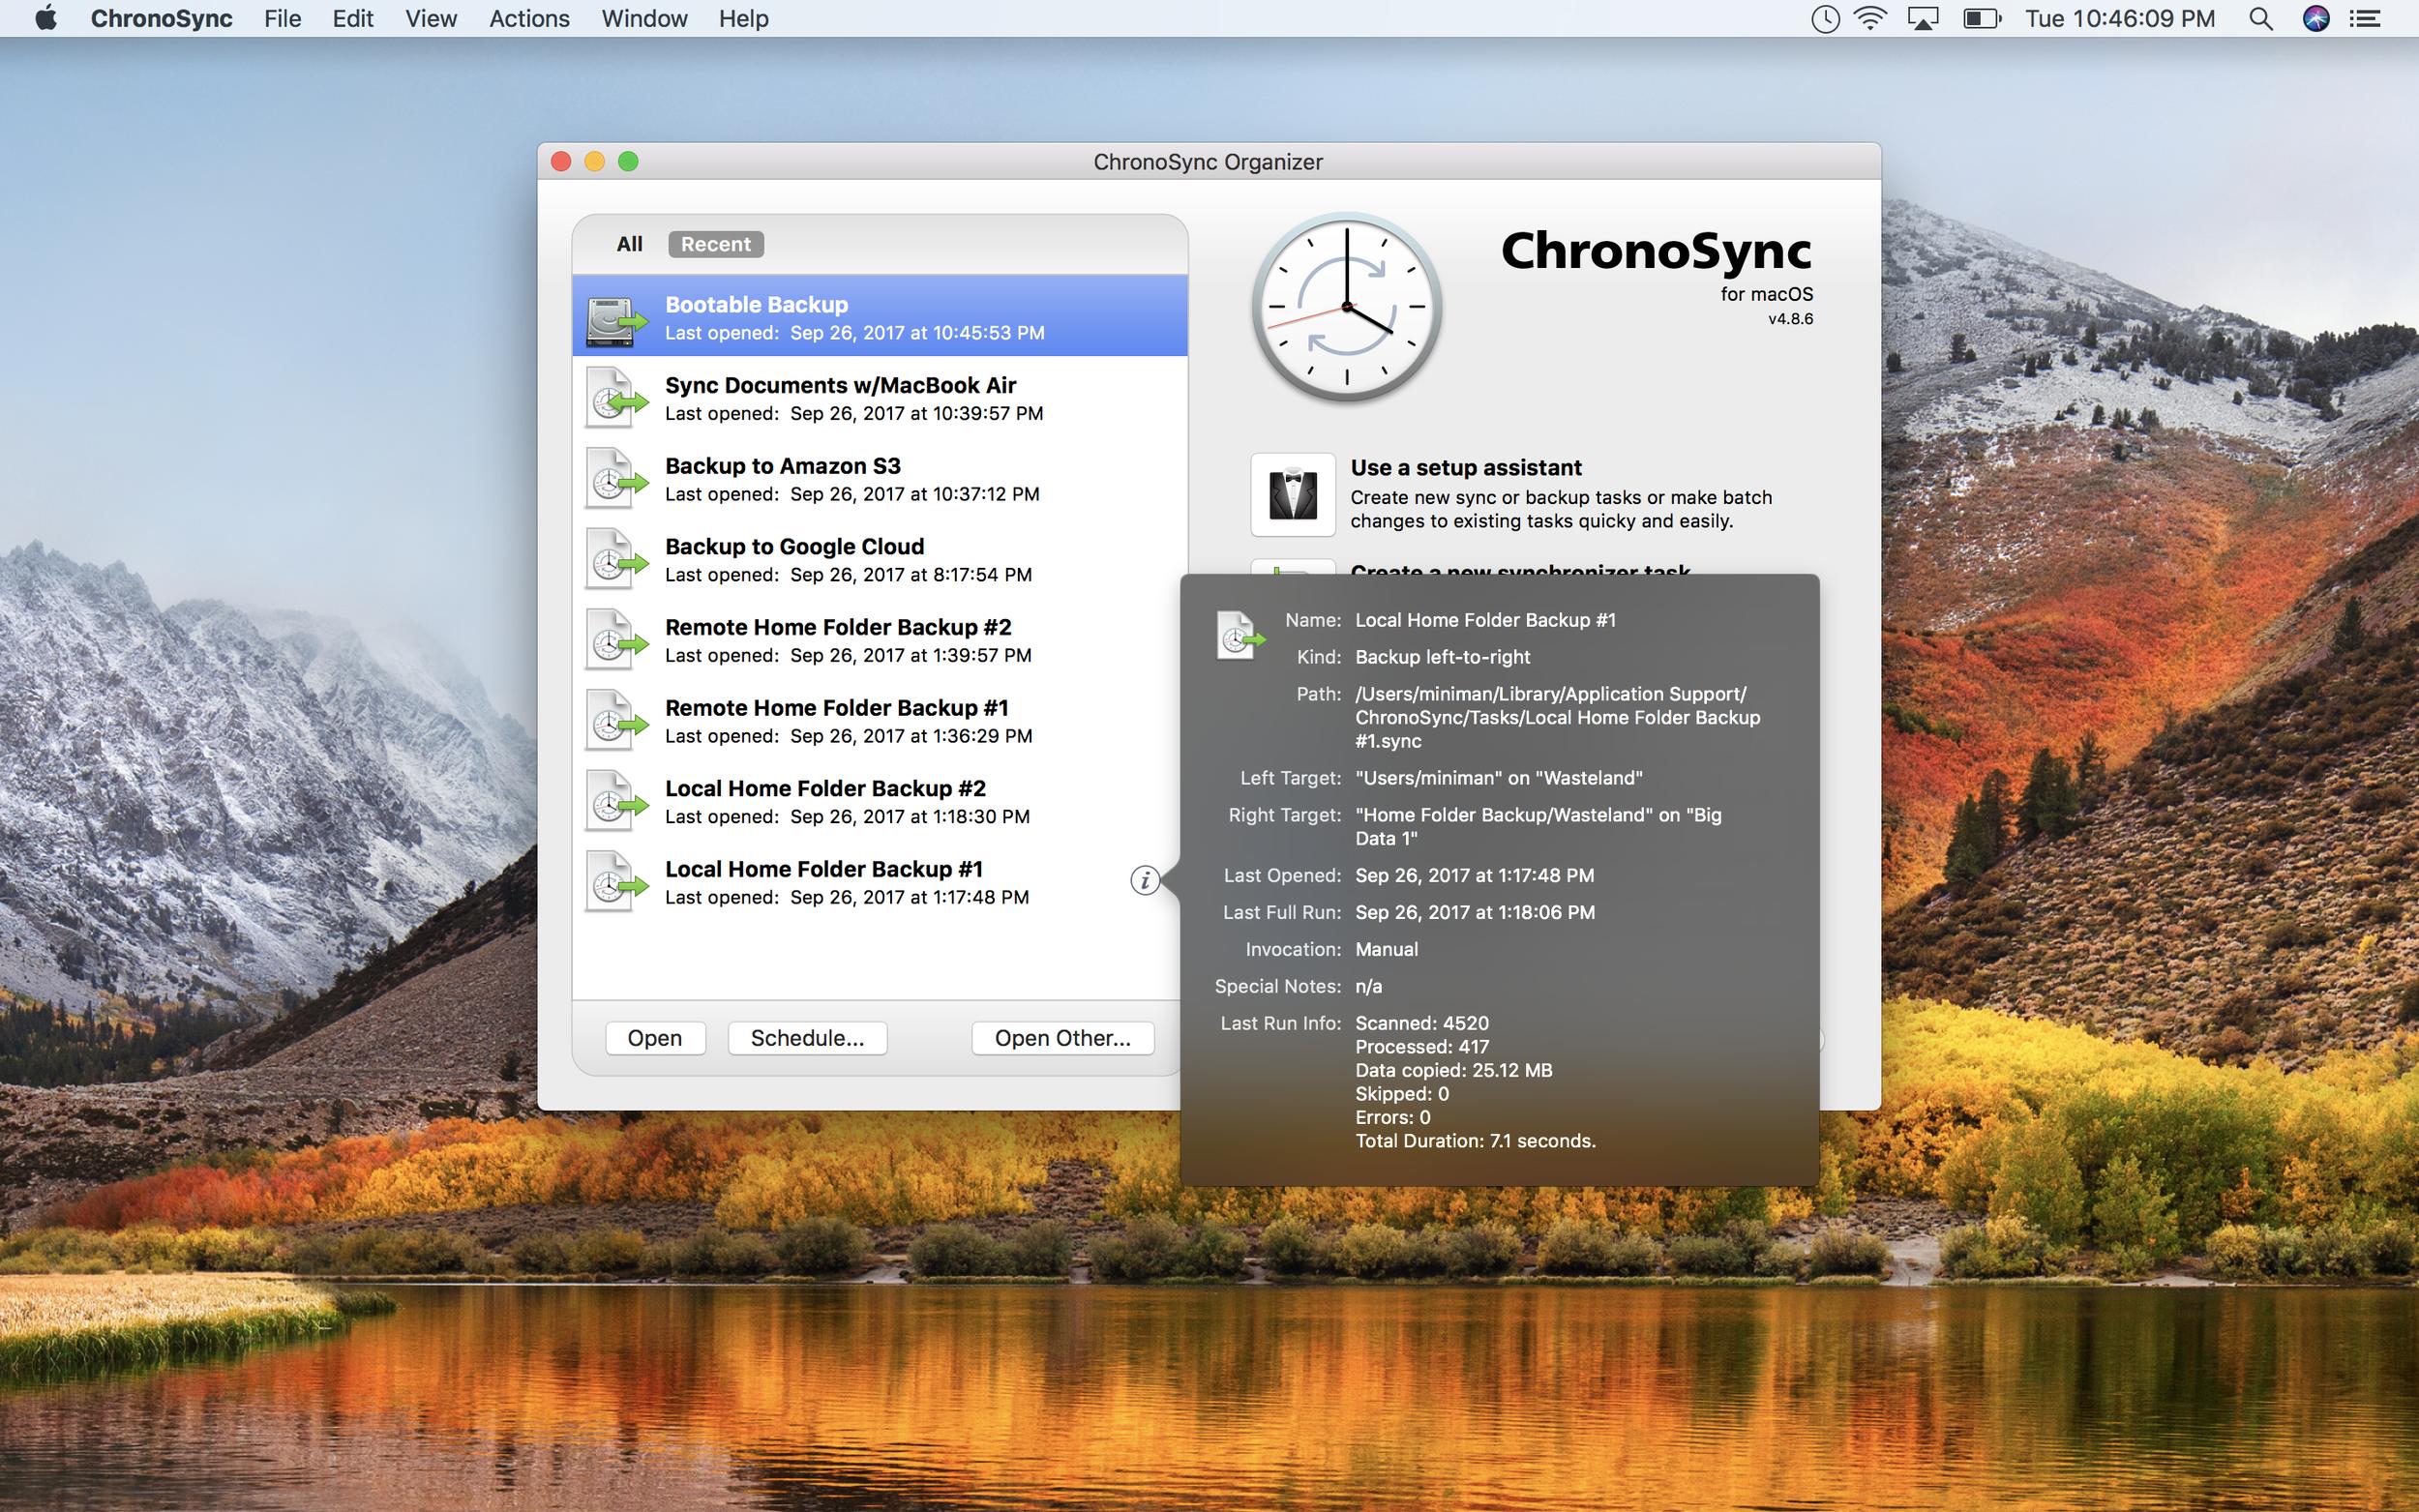 ChronoSync - ChronoSync-Organizer - SAC Student Discount.png